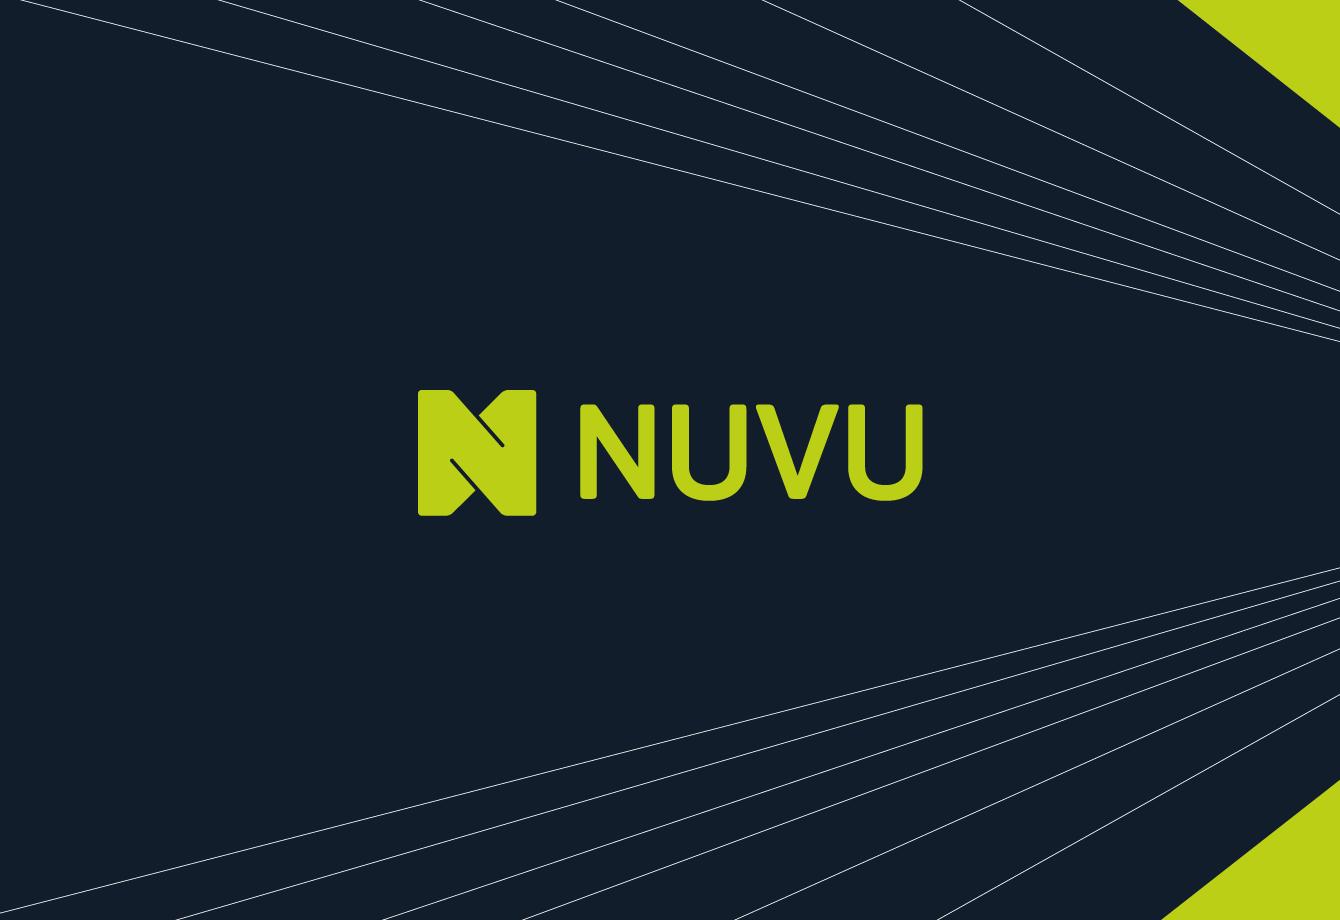 Nuvu-layout.png